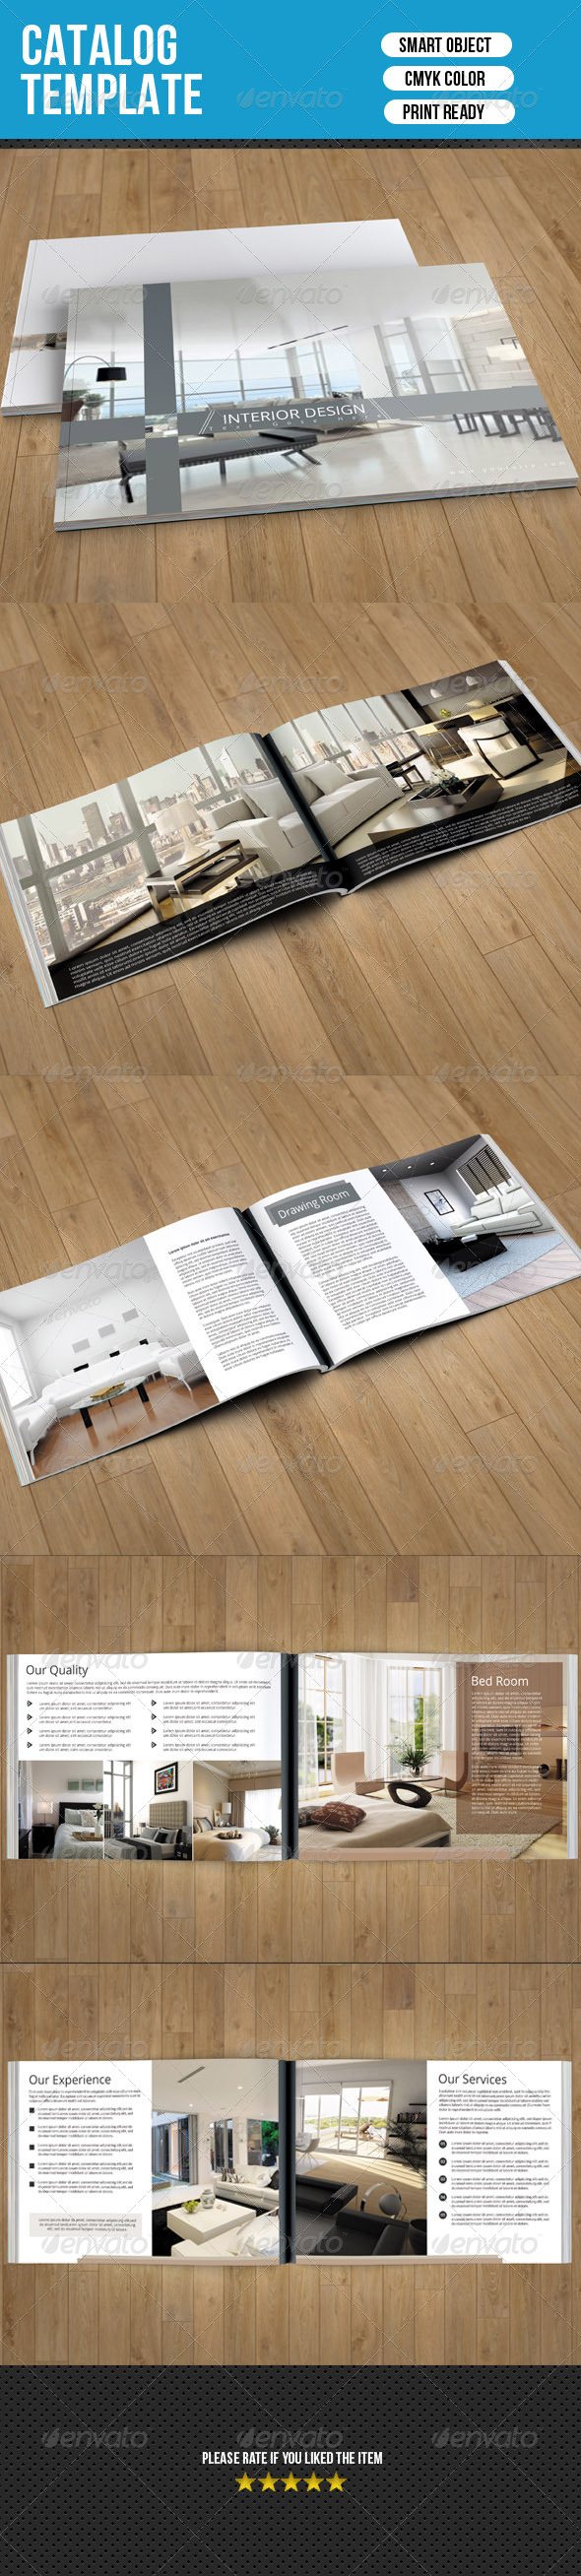 Interior Catalog Template